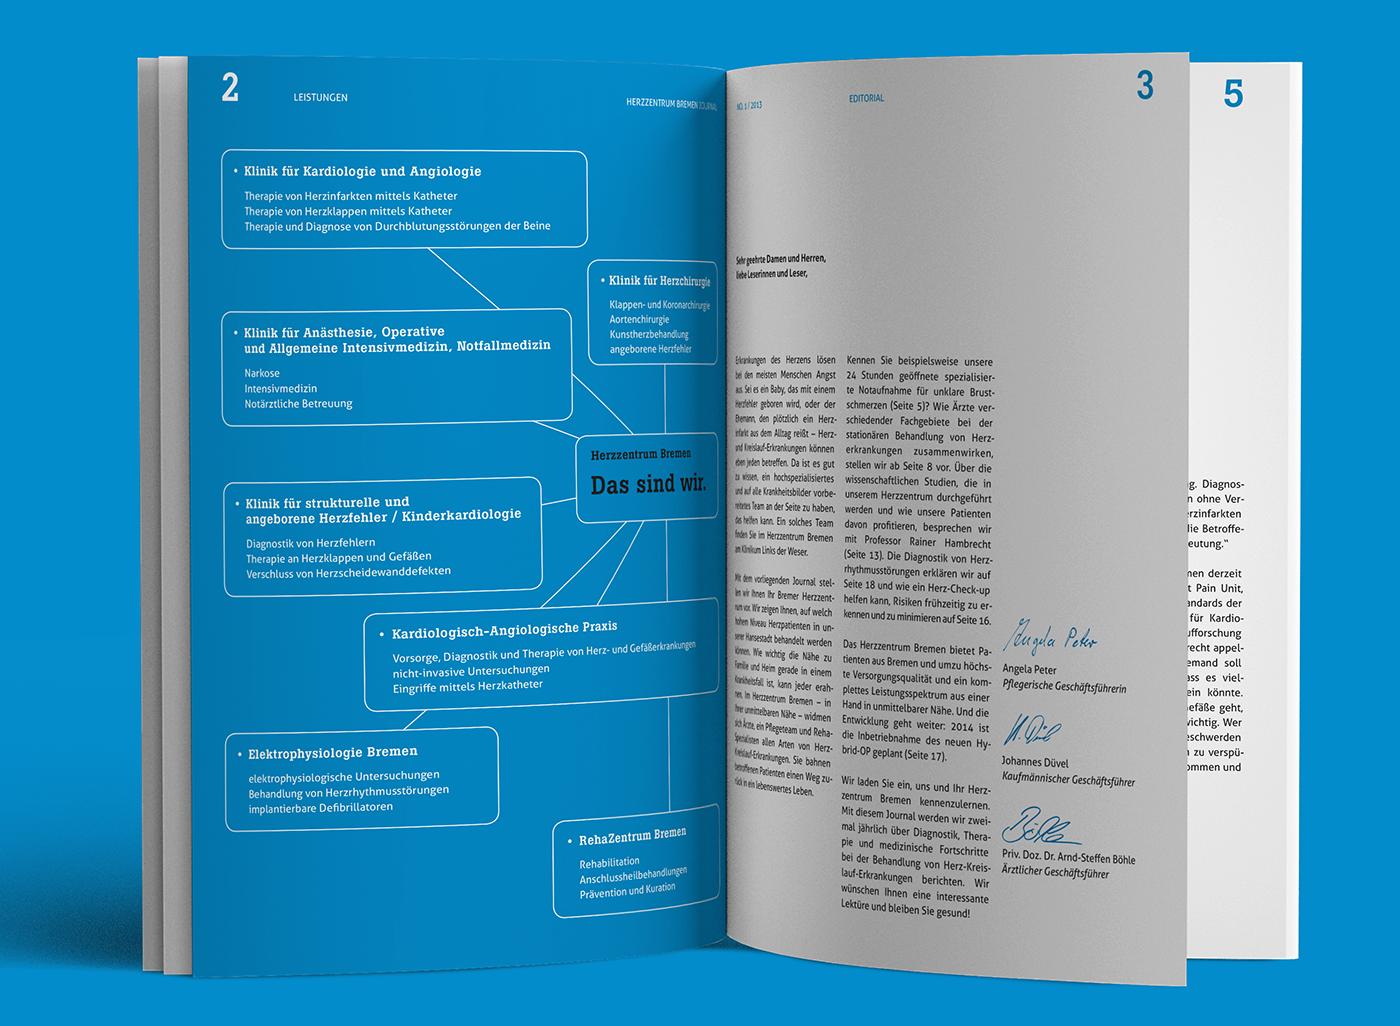 eskalade Herzzentrum Bremen Editorial Design